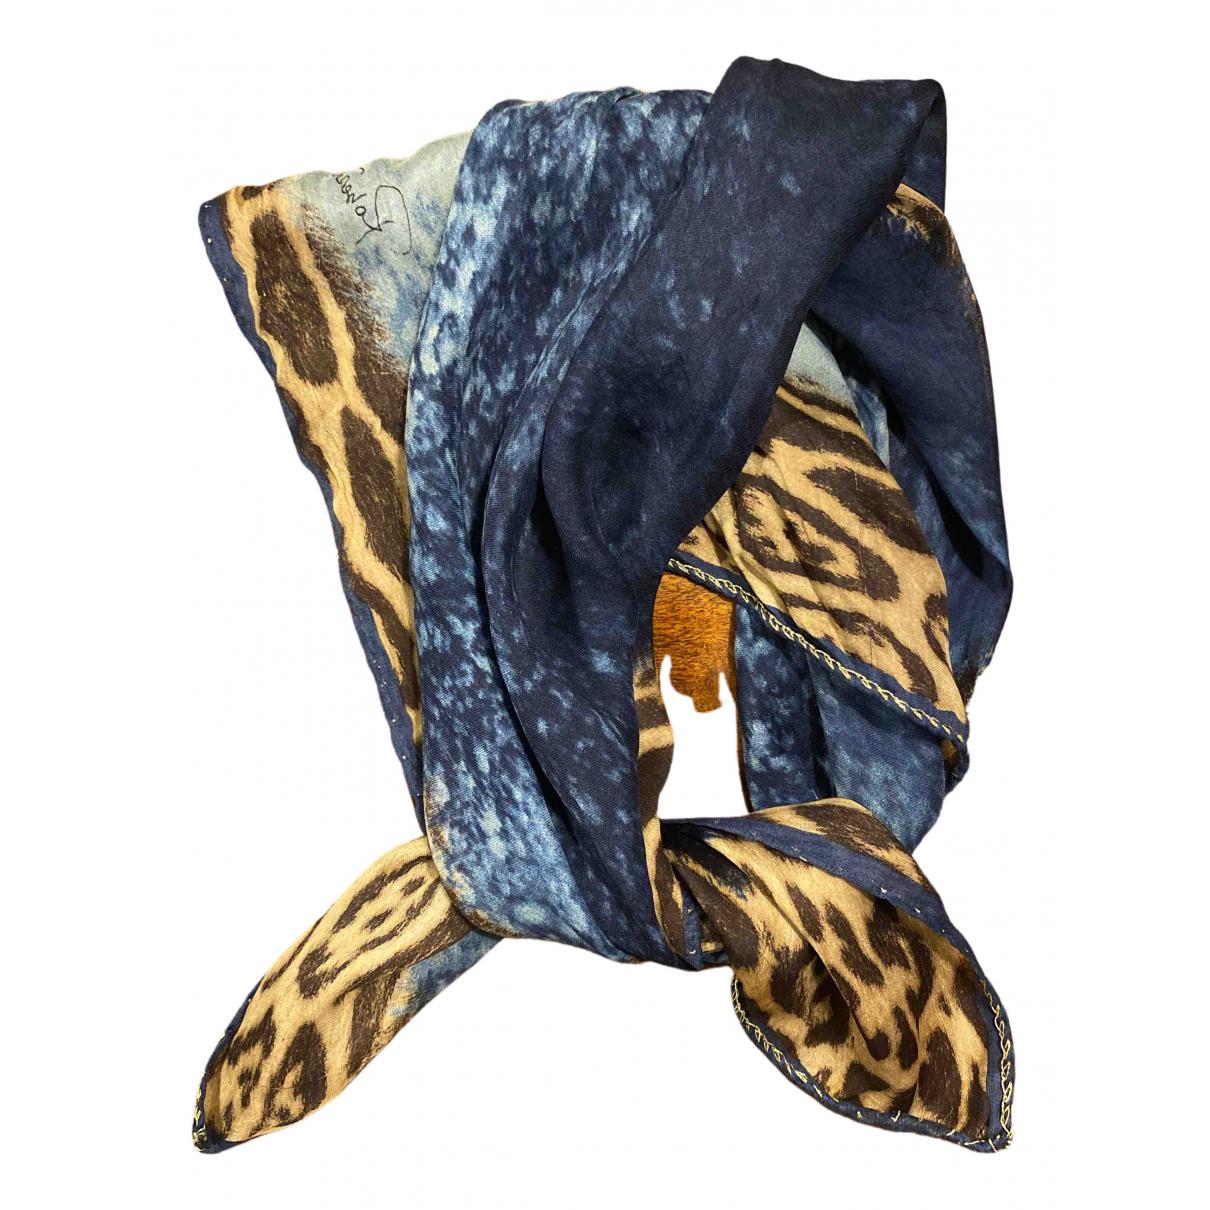 Roberto Cavalli N Silk scarf for Women N